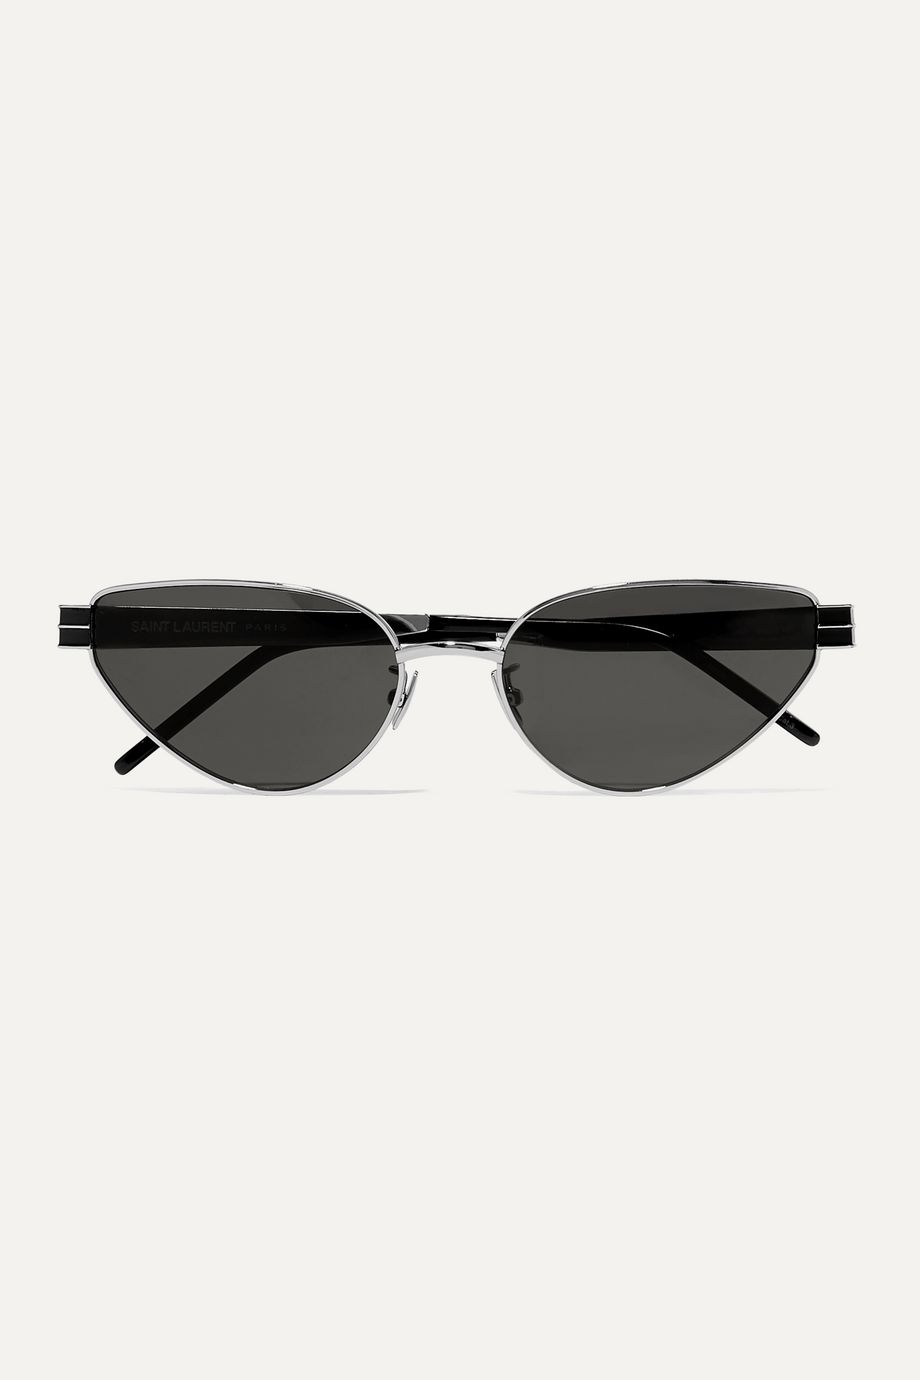 SAINT LAURENT Vintage Monogram cat-eye silver-tone and acetate sunglasses